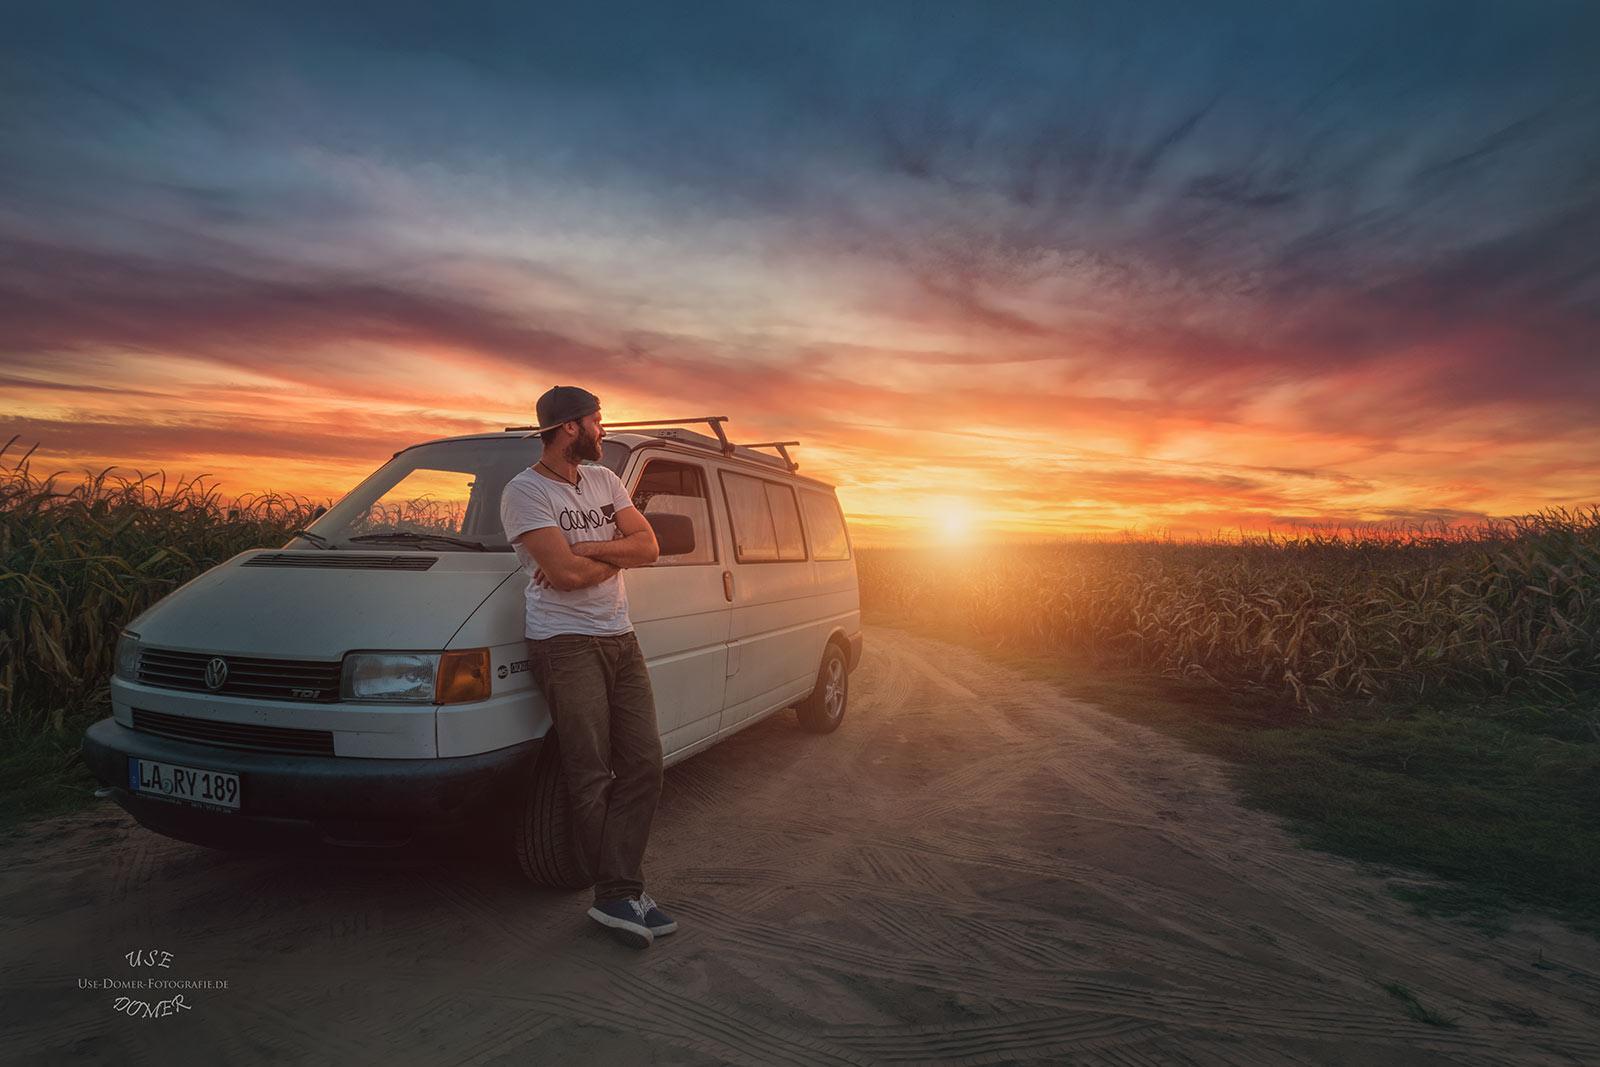 Fotograf Insel Usedom Portrait Shooting Menschen Digital Art Strand